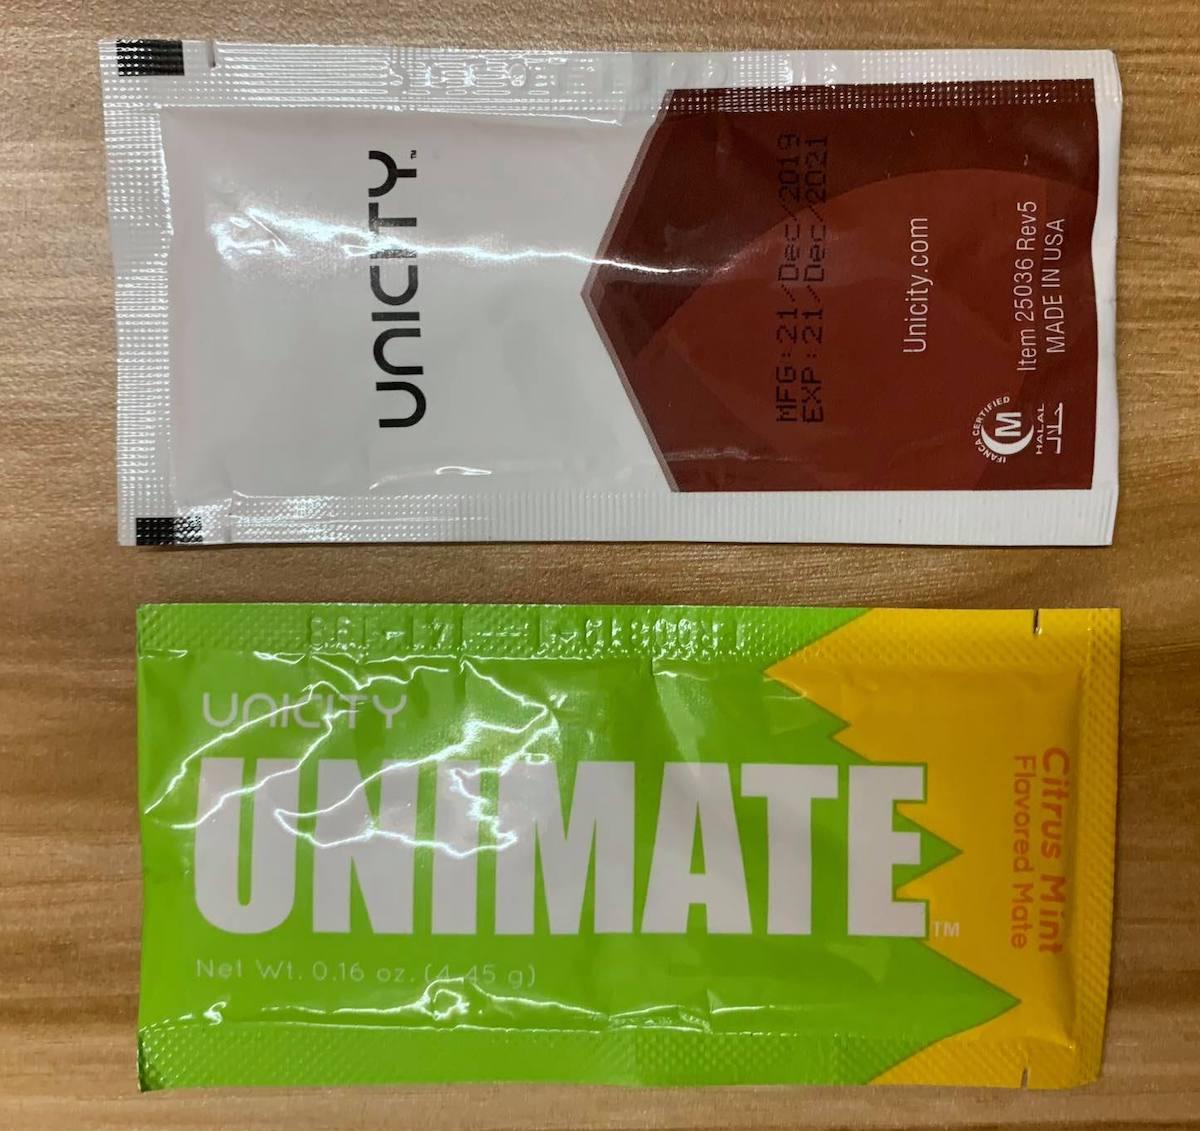 Hai sản phẩm Unimate và Bios life E của Unicity.